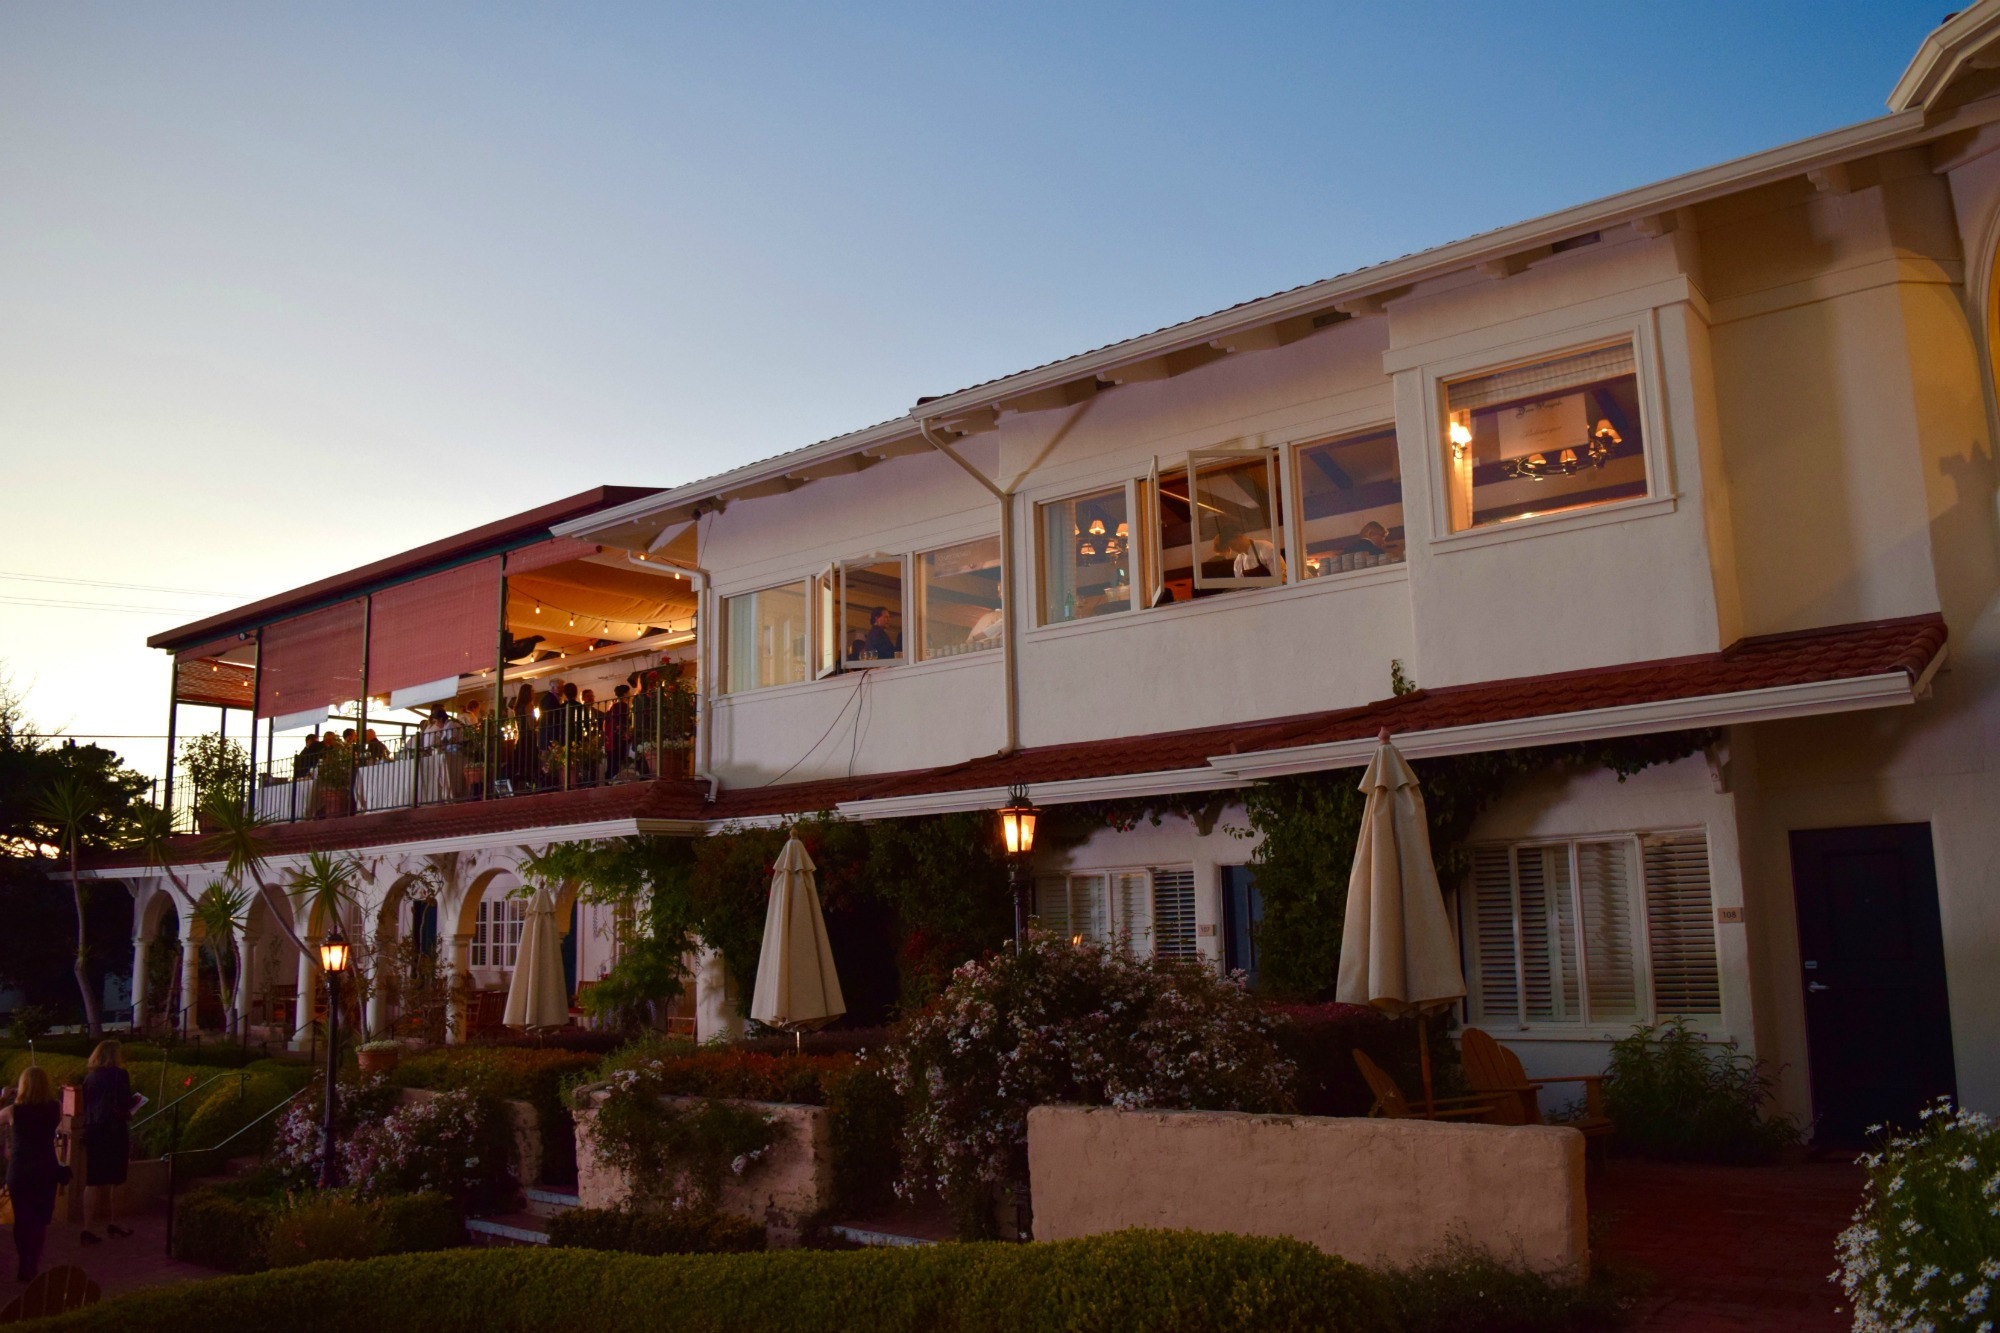 La Playa Carmel Relais Chateaux GourmetFest